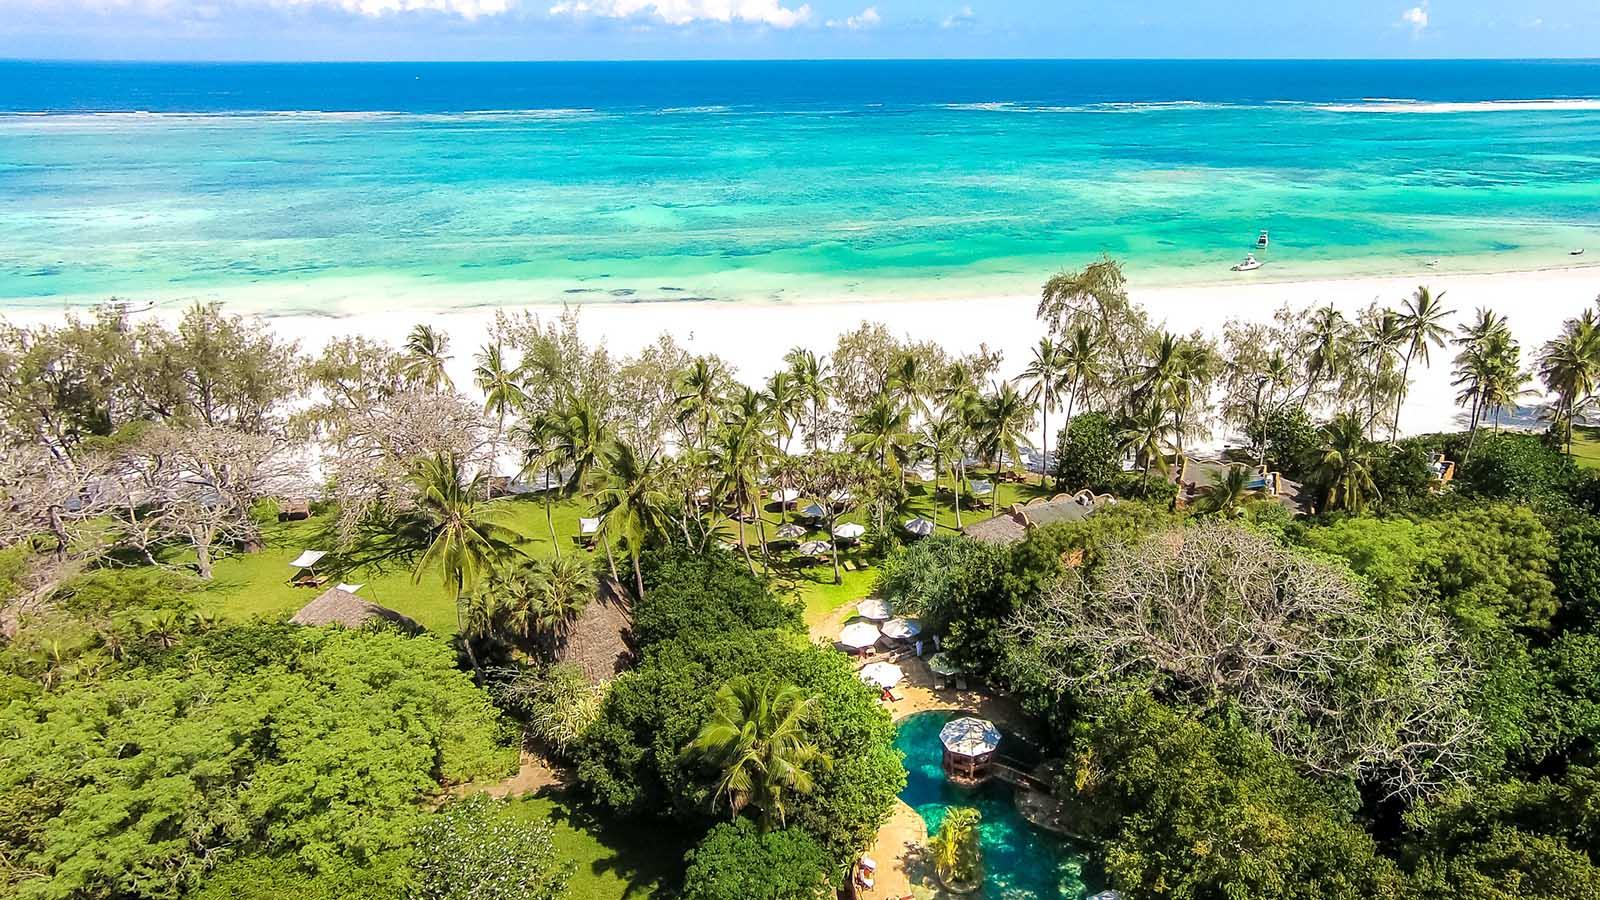 The Sands Kenya - Diani Beach - The Sands Kenya Group